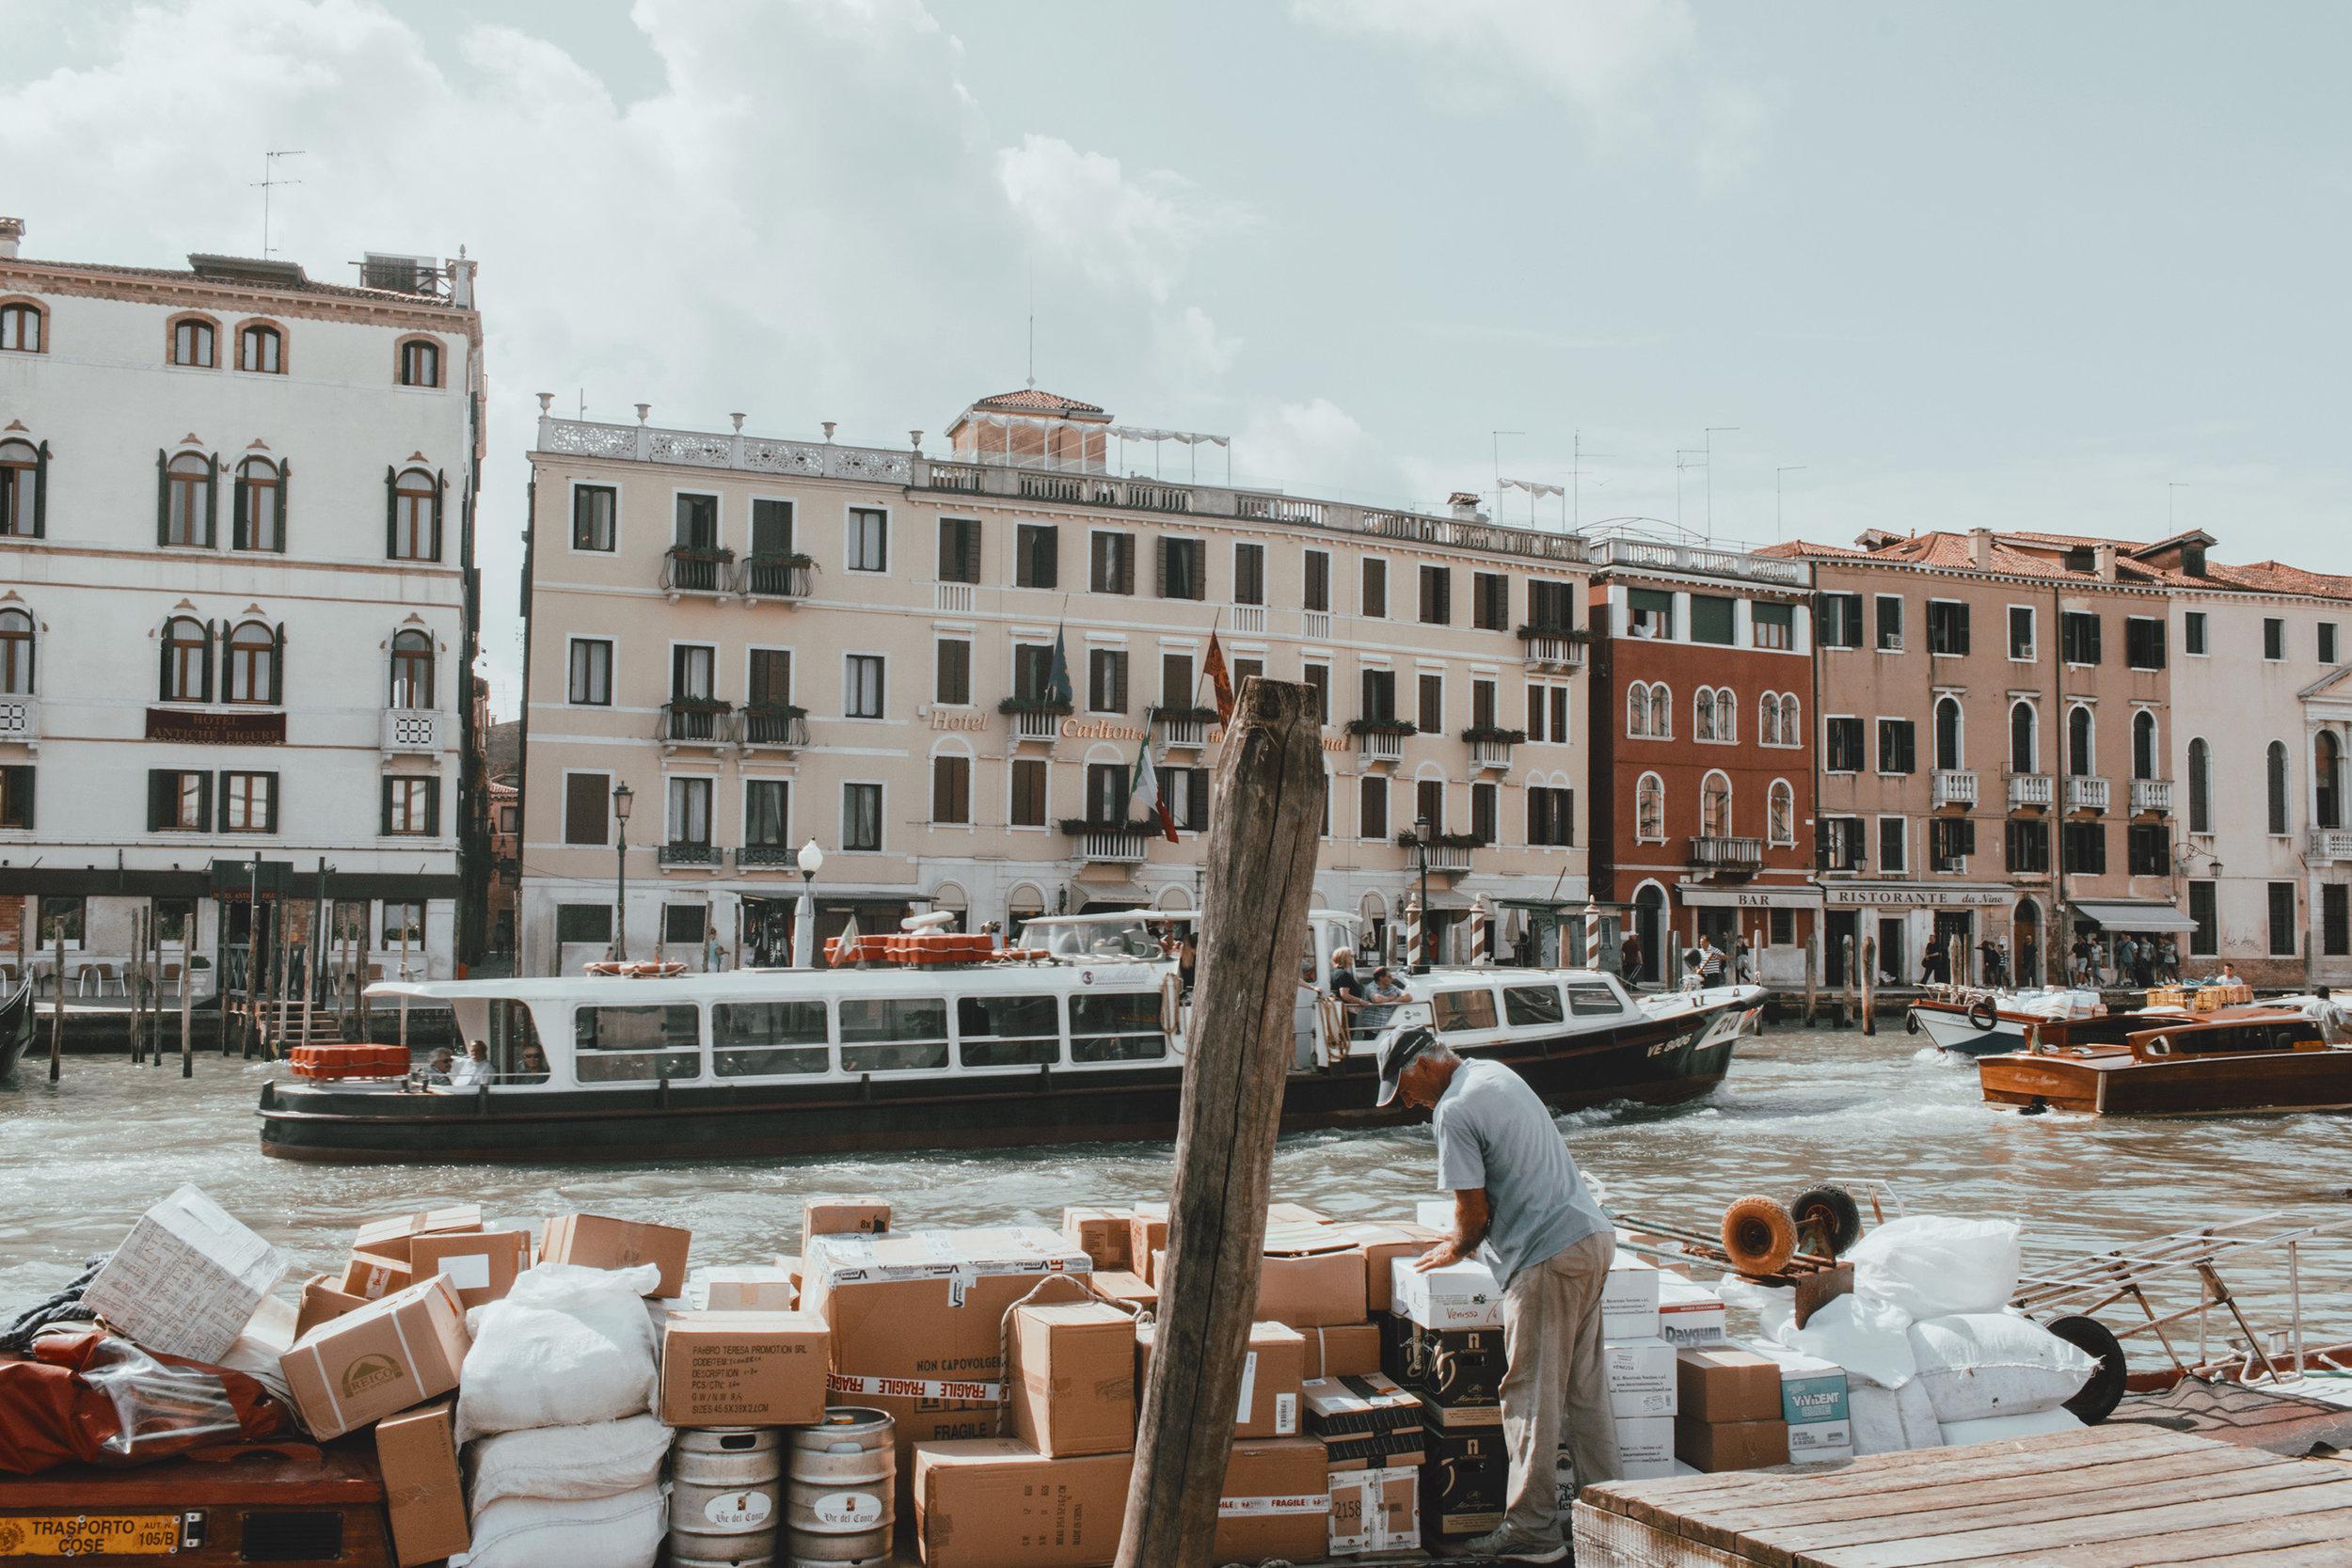 Venice_06022016_007.jpg